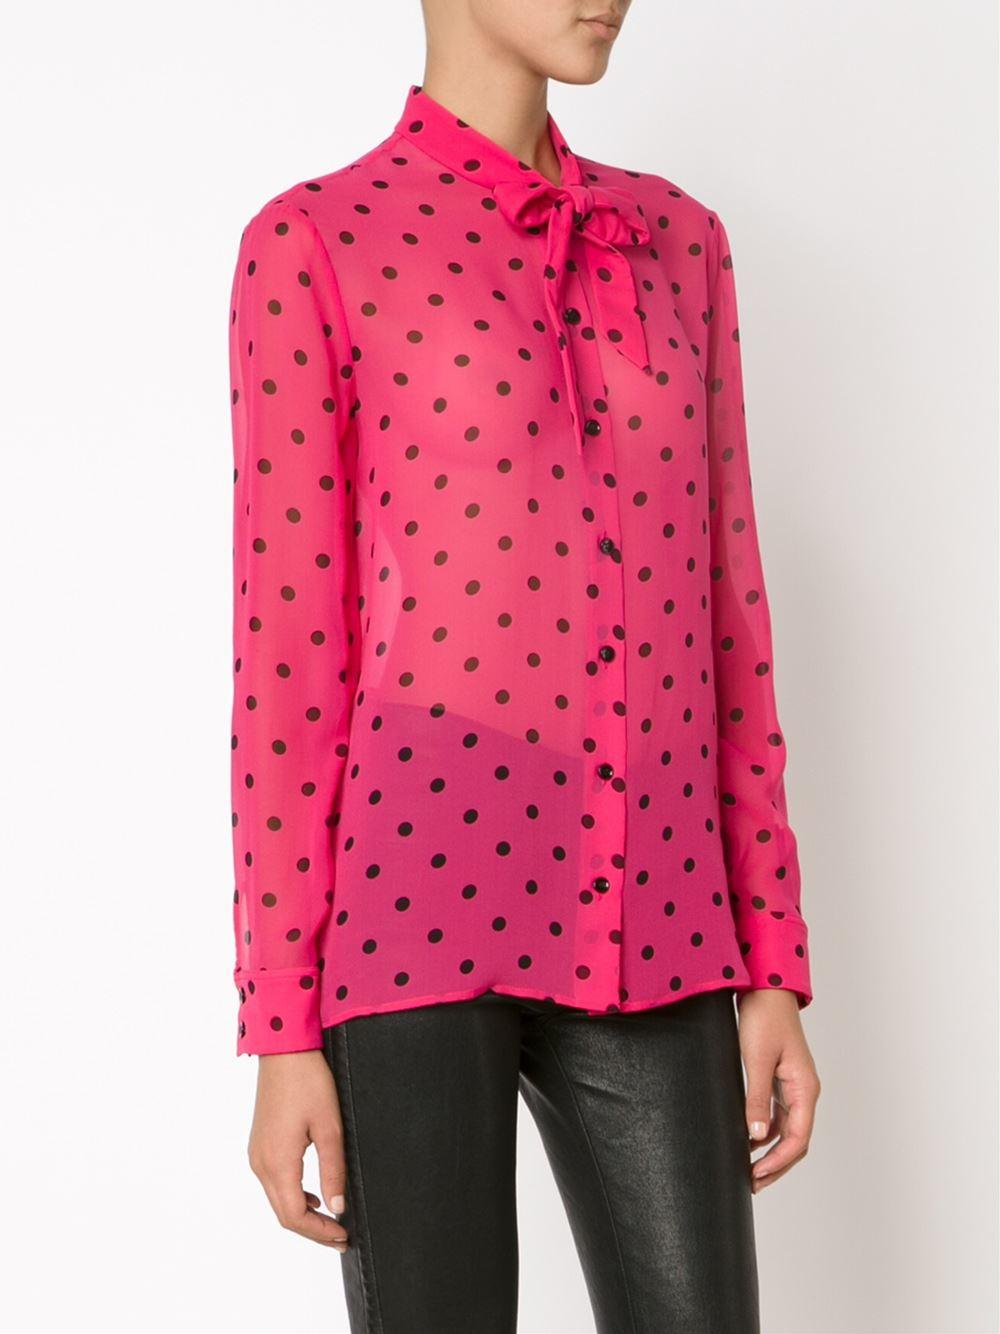 Lyst saint laurent polka dot print shirt in pink for Saint laurent shirt womens